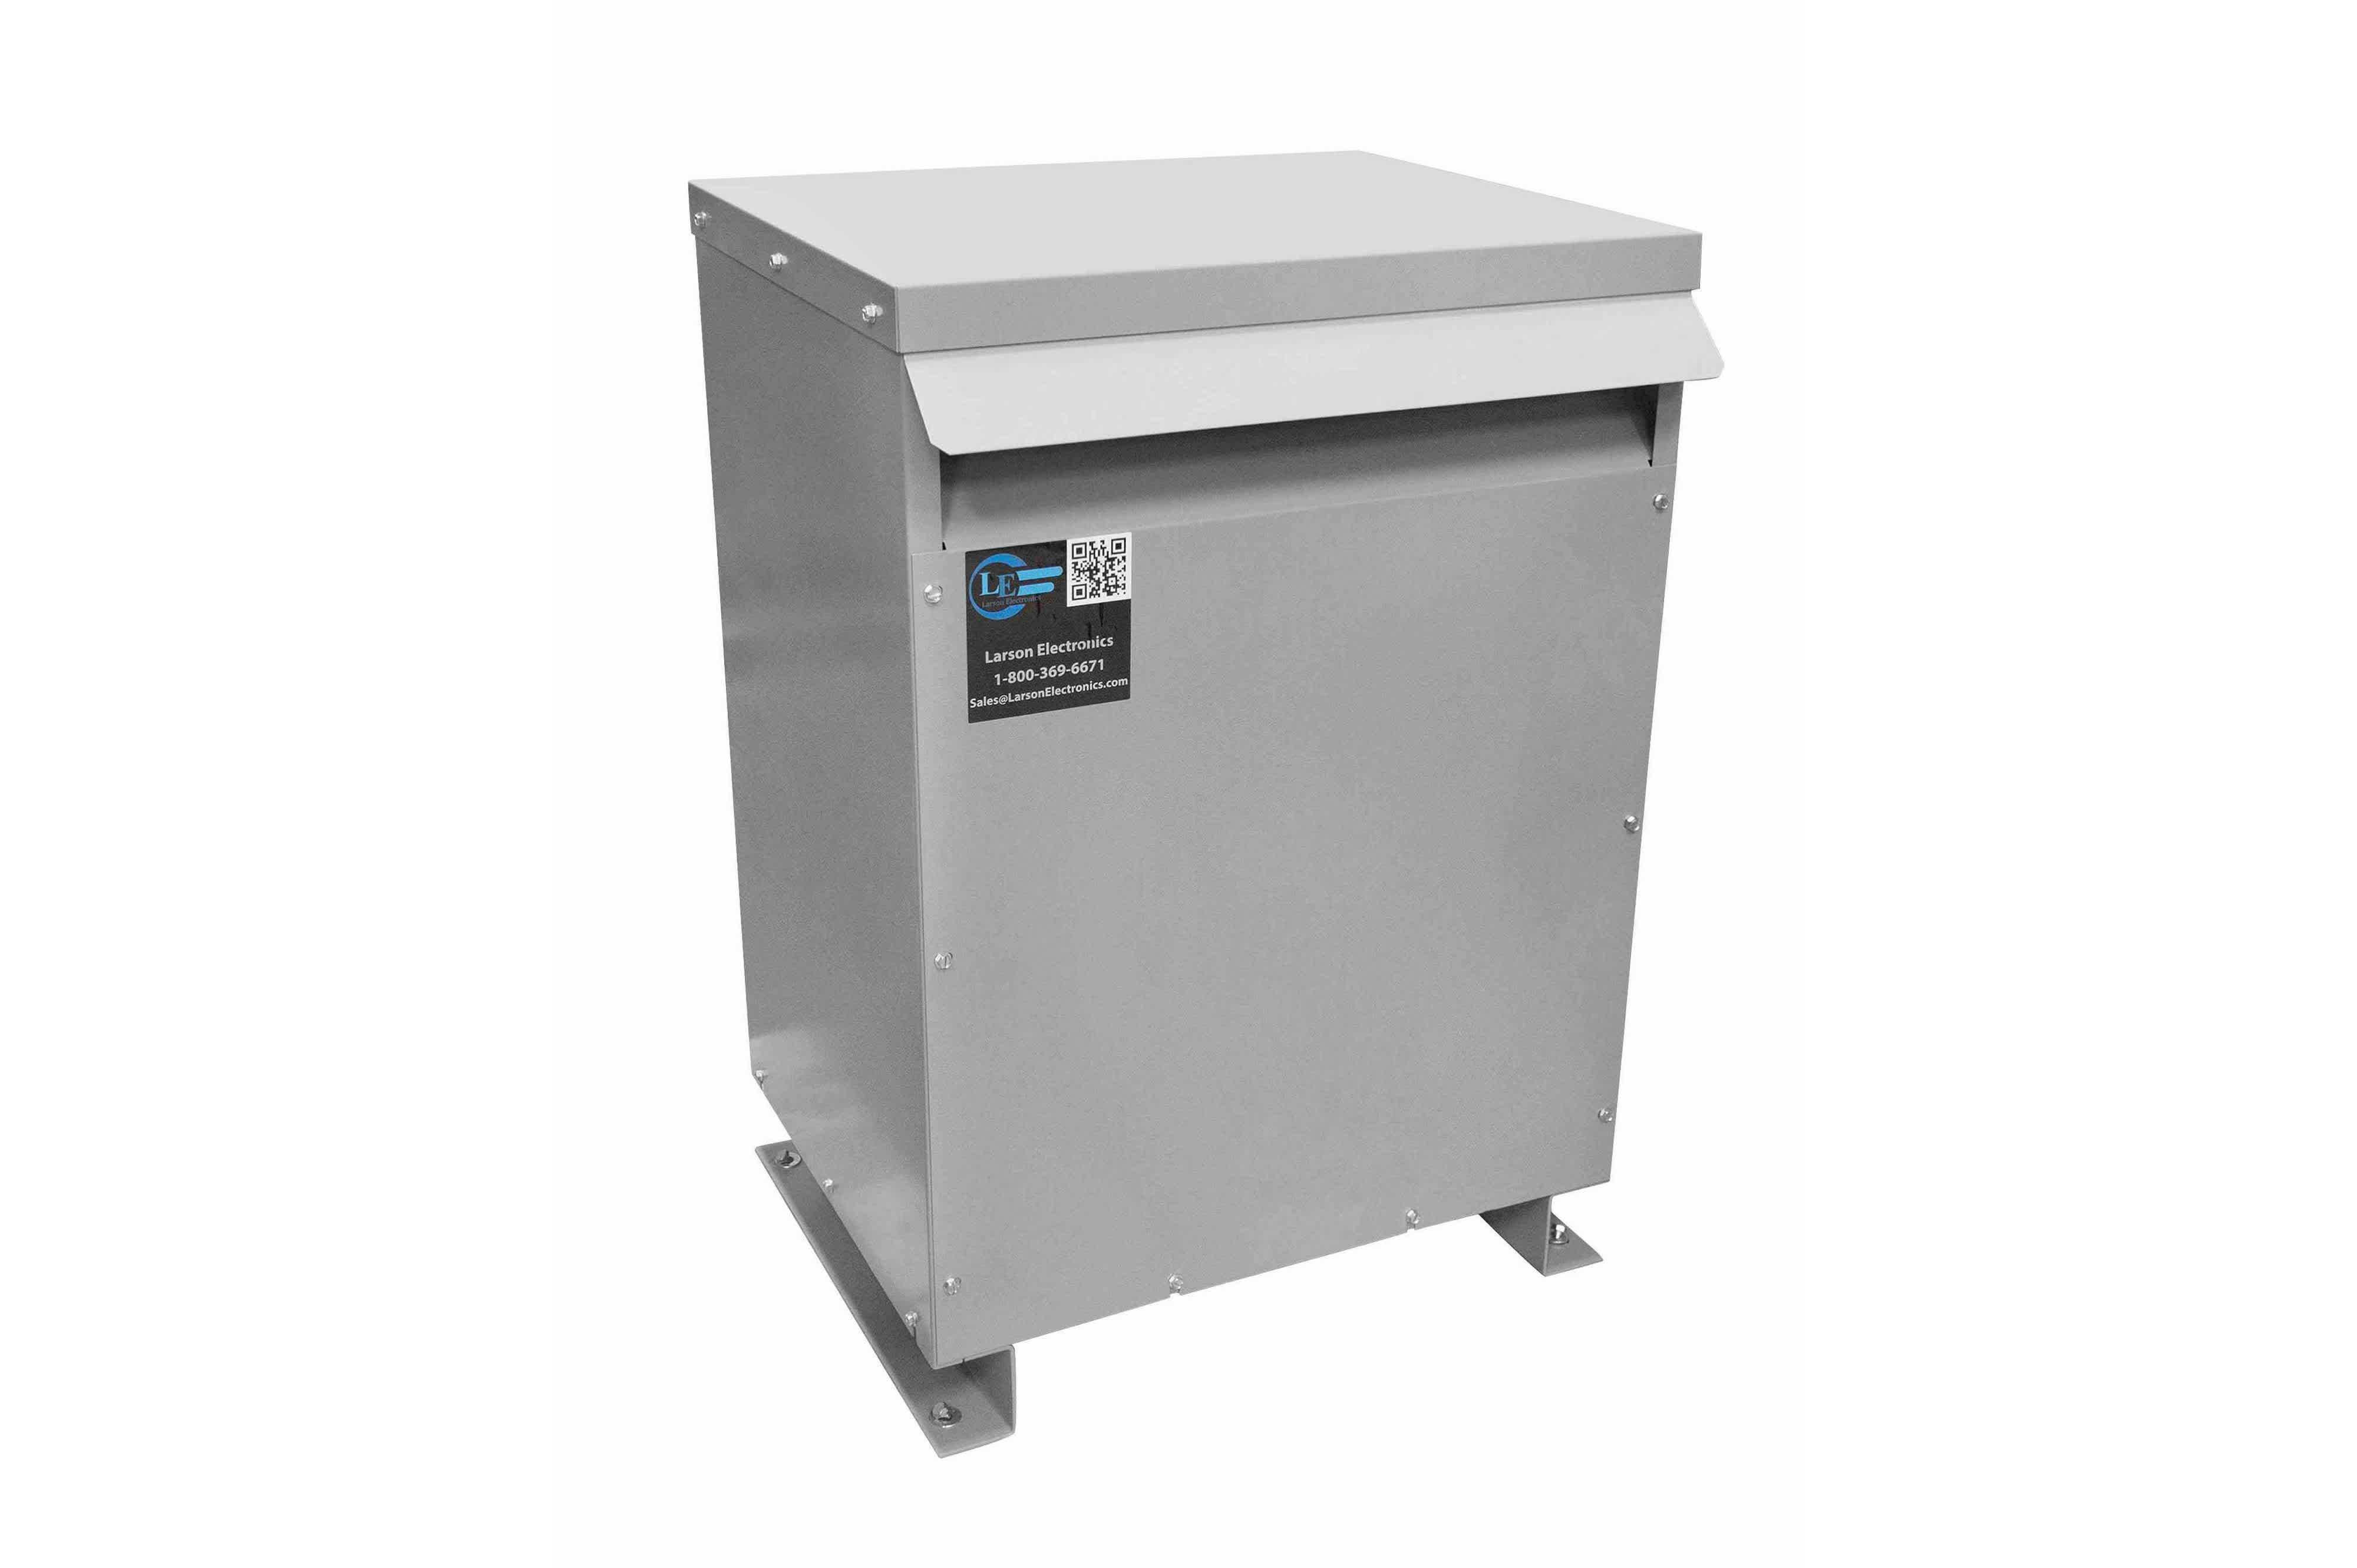 26 kVA 3PH Isolation Transformer, 240V Wye Primary, 600V Delta Secondary, N3R, Ventilated, 60 Hz